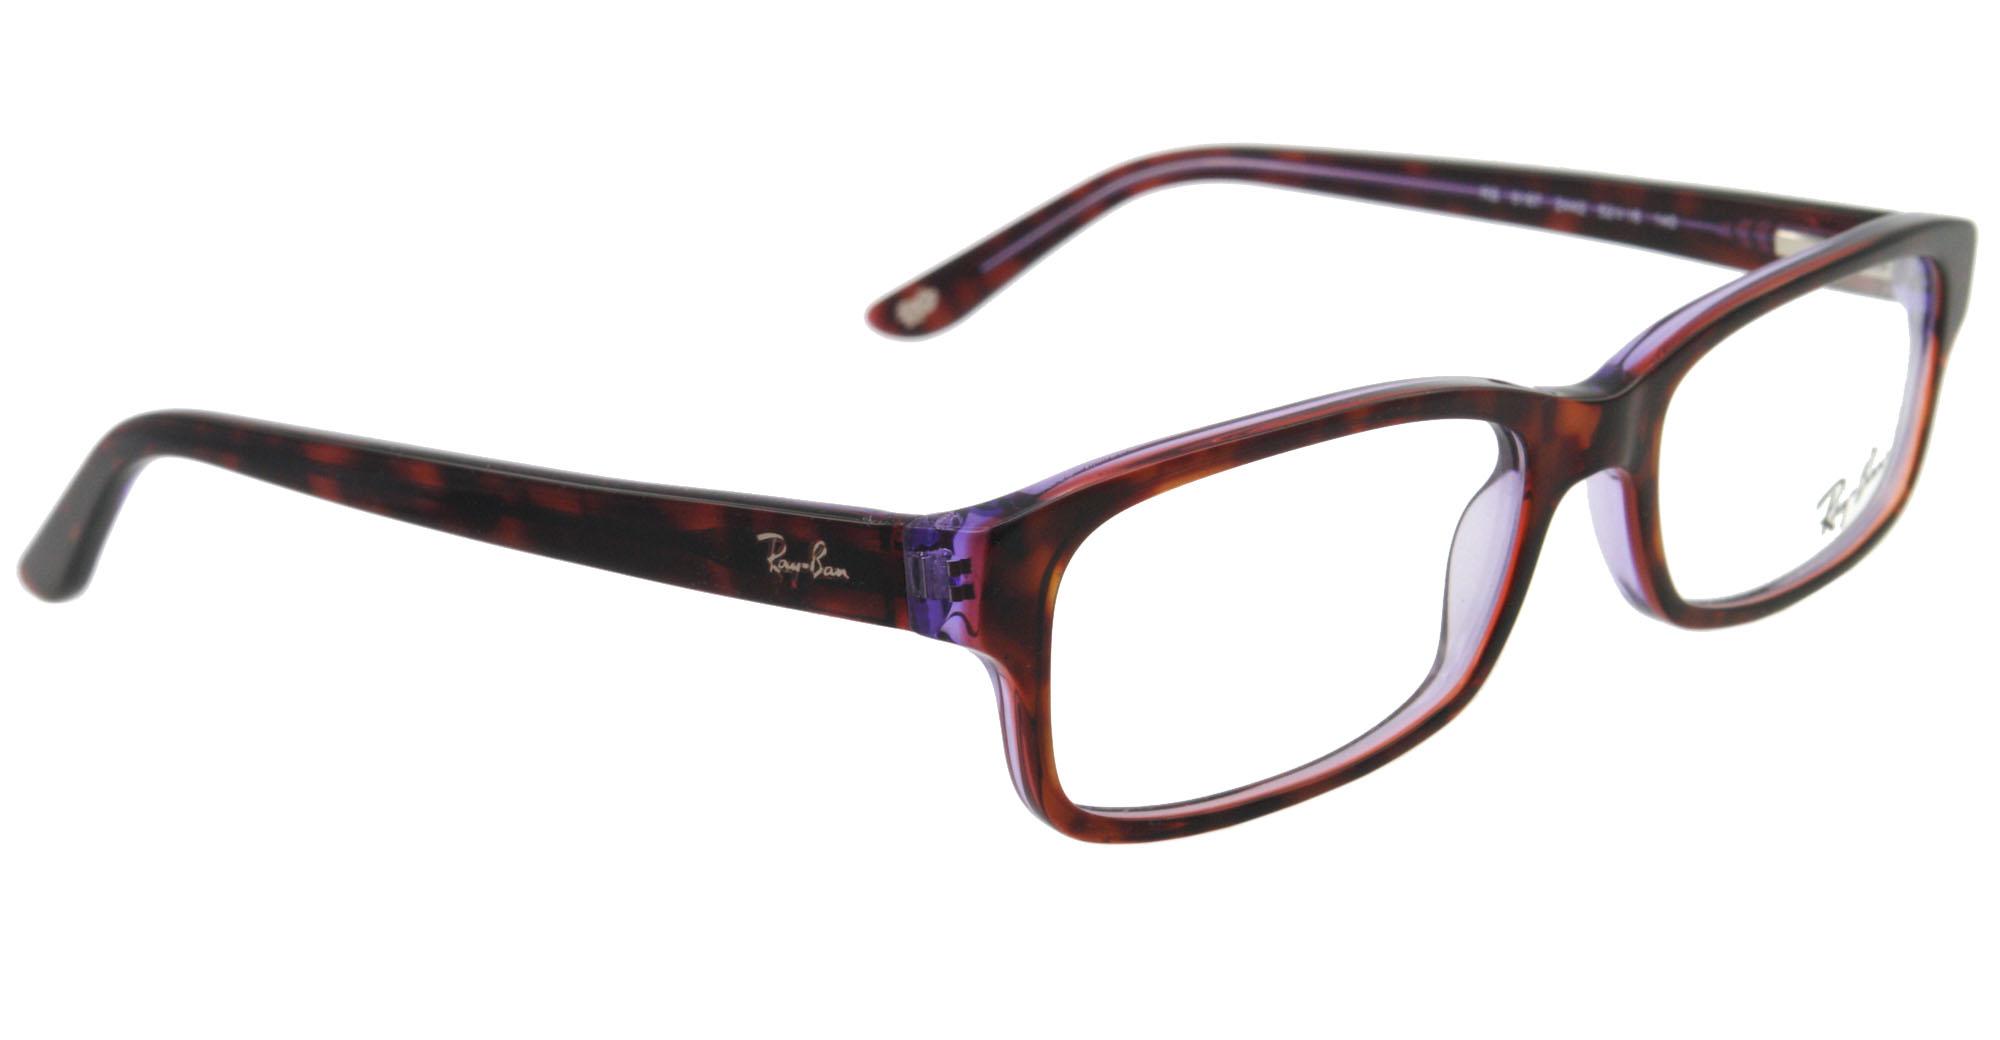 07b72e1864a Ray Ban RB 5187 2442 Eyeglasses Frames 52mm - 155